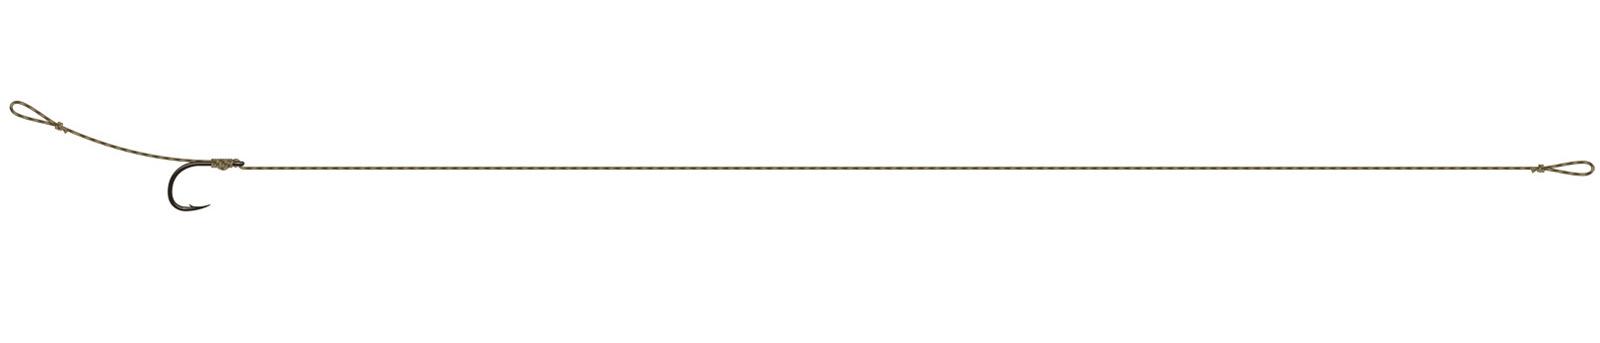 Basic Special Rig 4-es méret  2db/cs